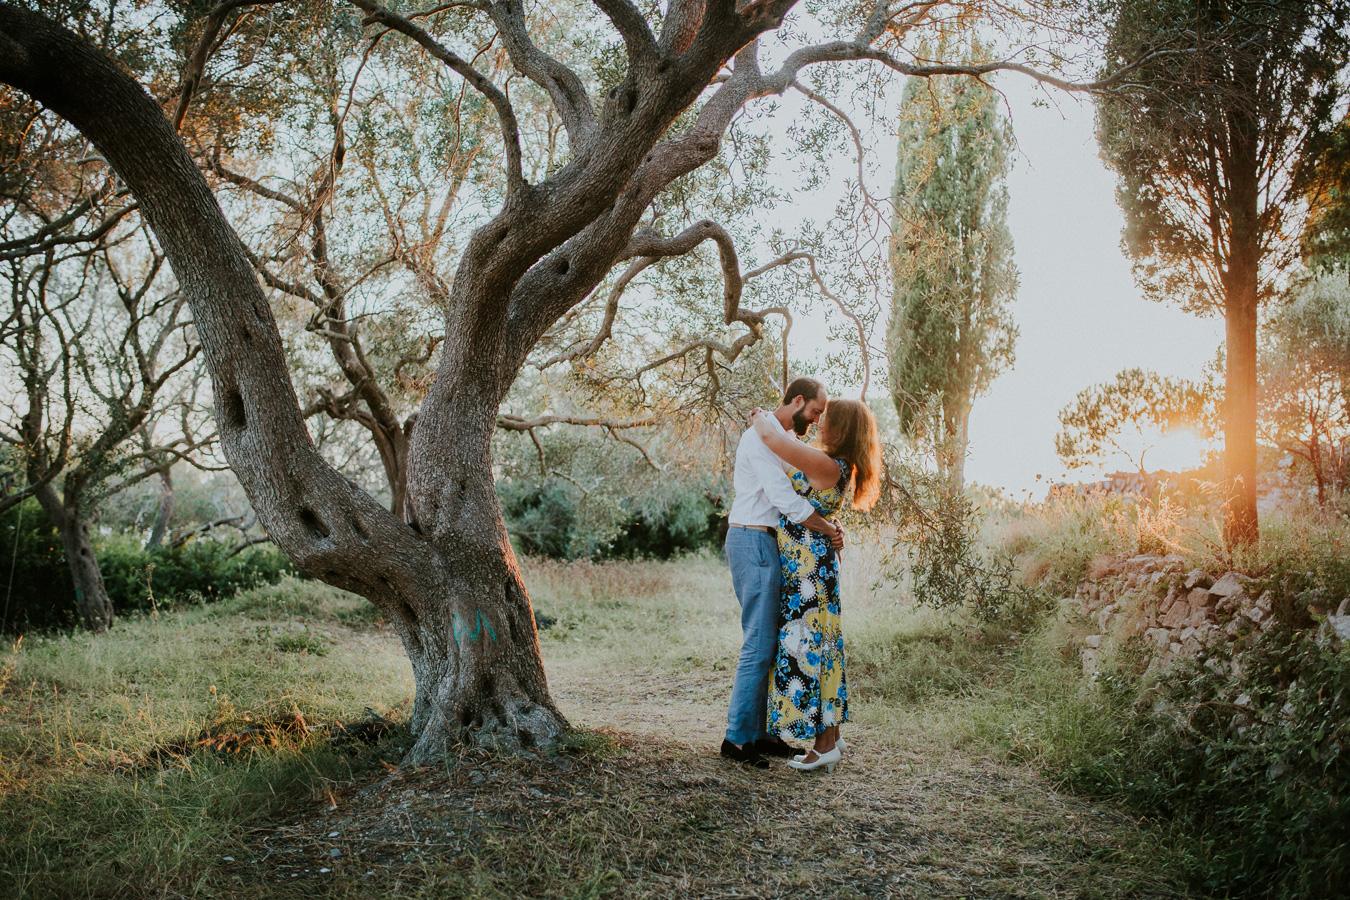 009-bryllupsfotograf-oslo-destinasjonsbryllup-fotograf-tone-tvedt.jpg